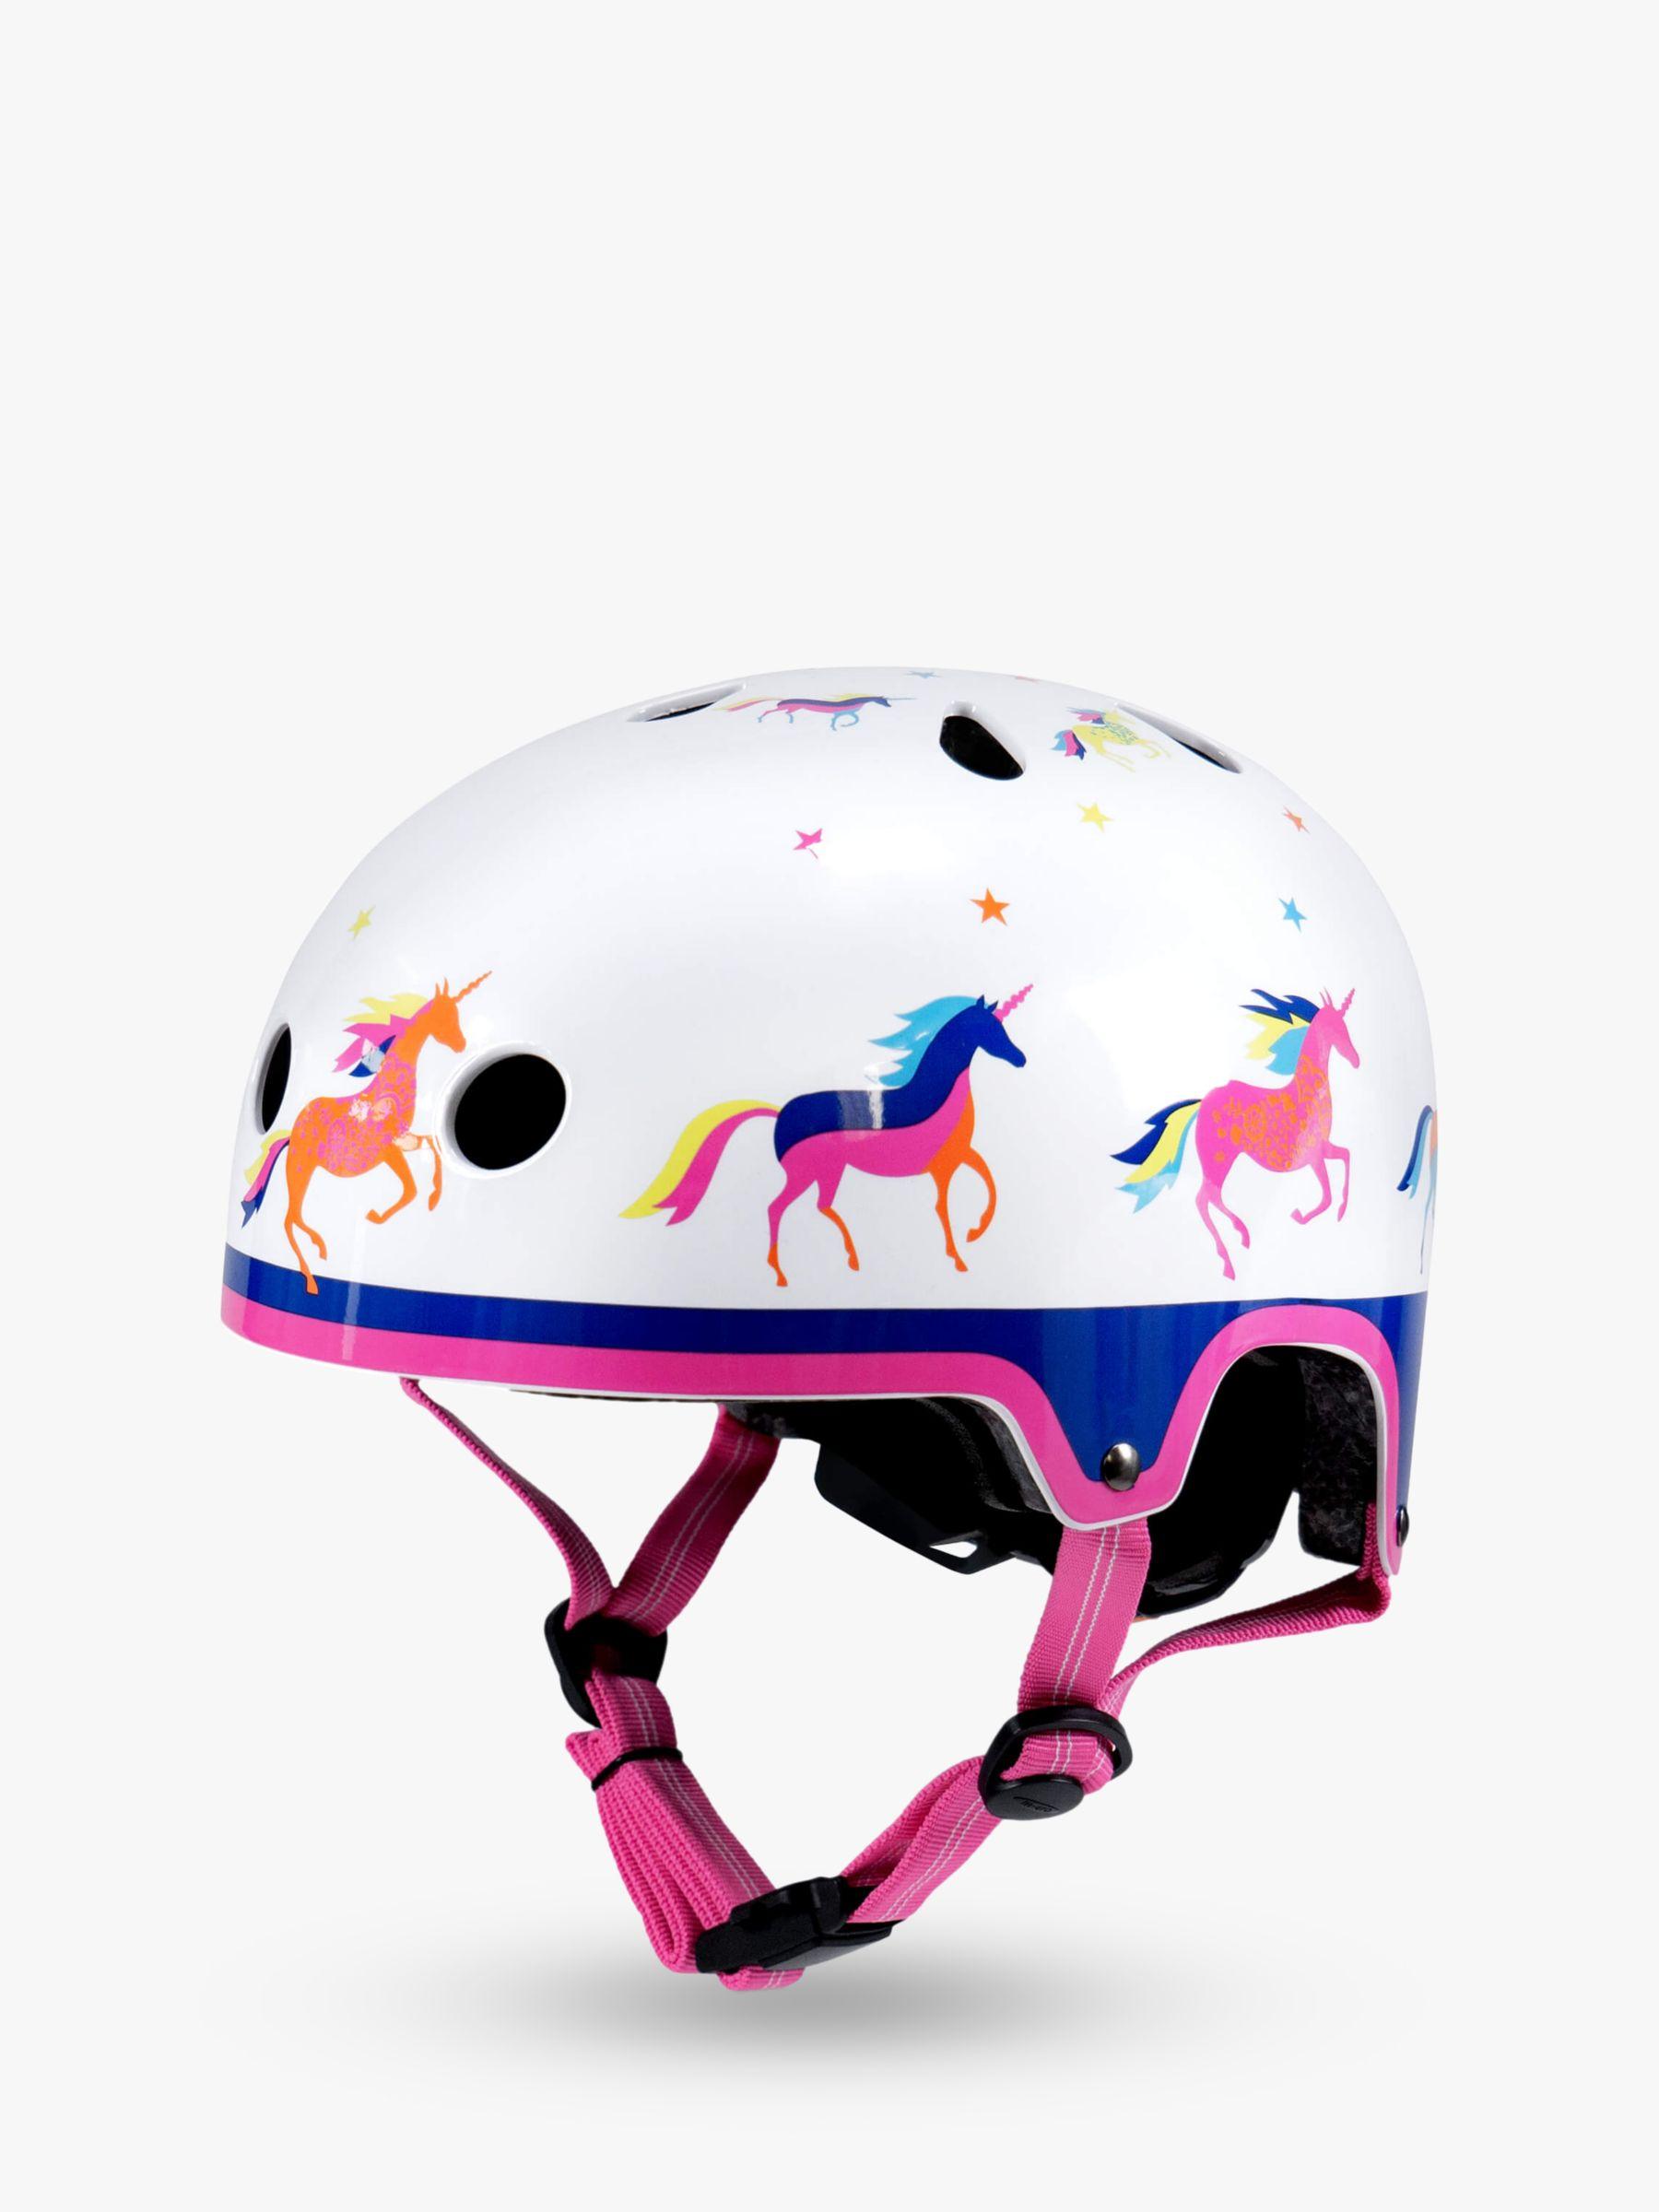 Micro Micro Scooter Unicorn Safety Helmet, Small